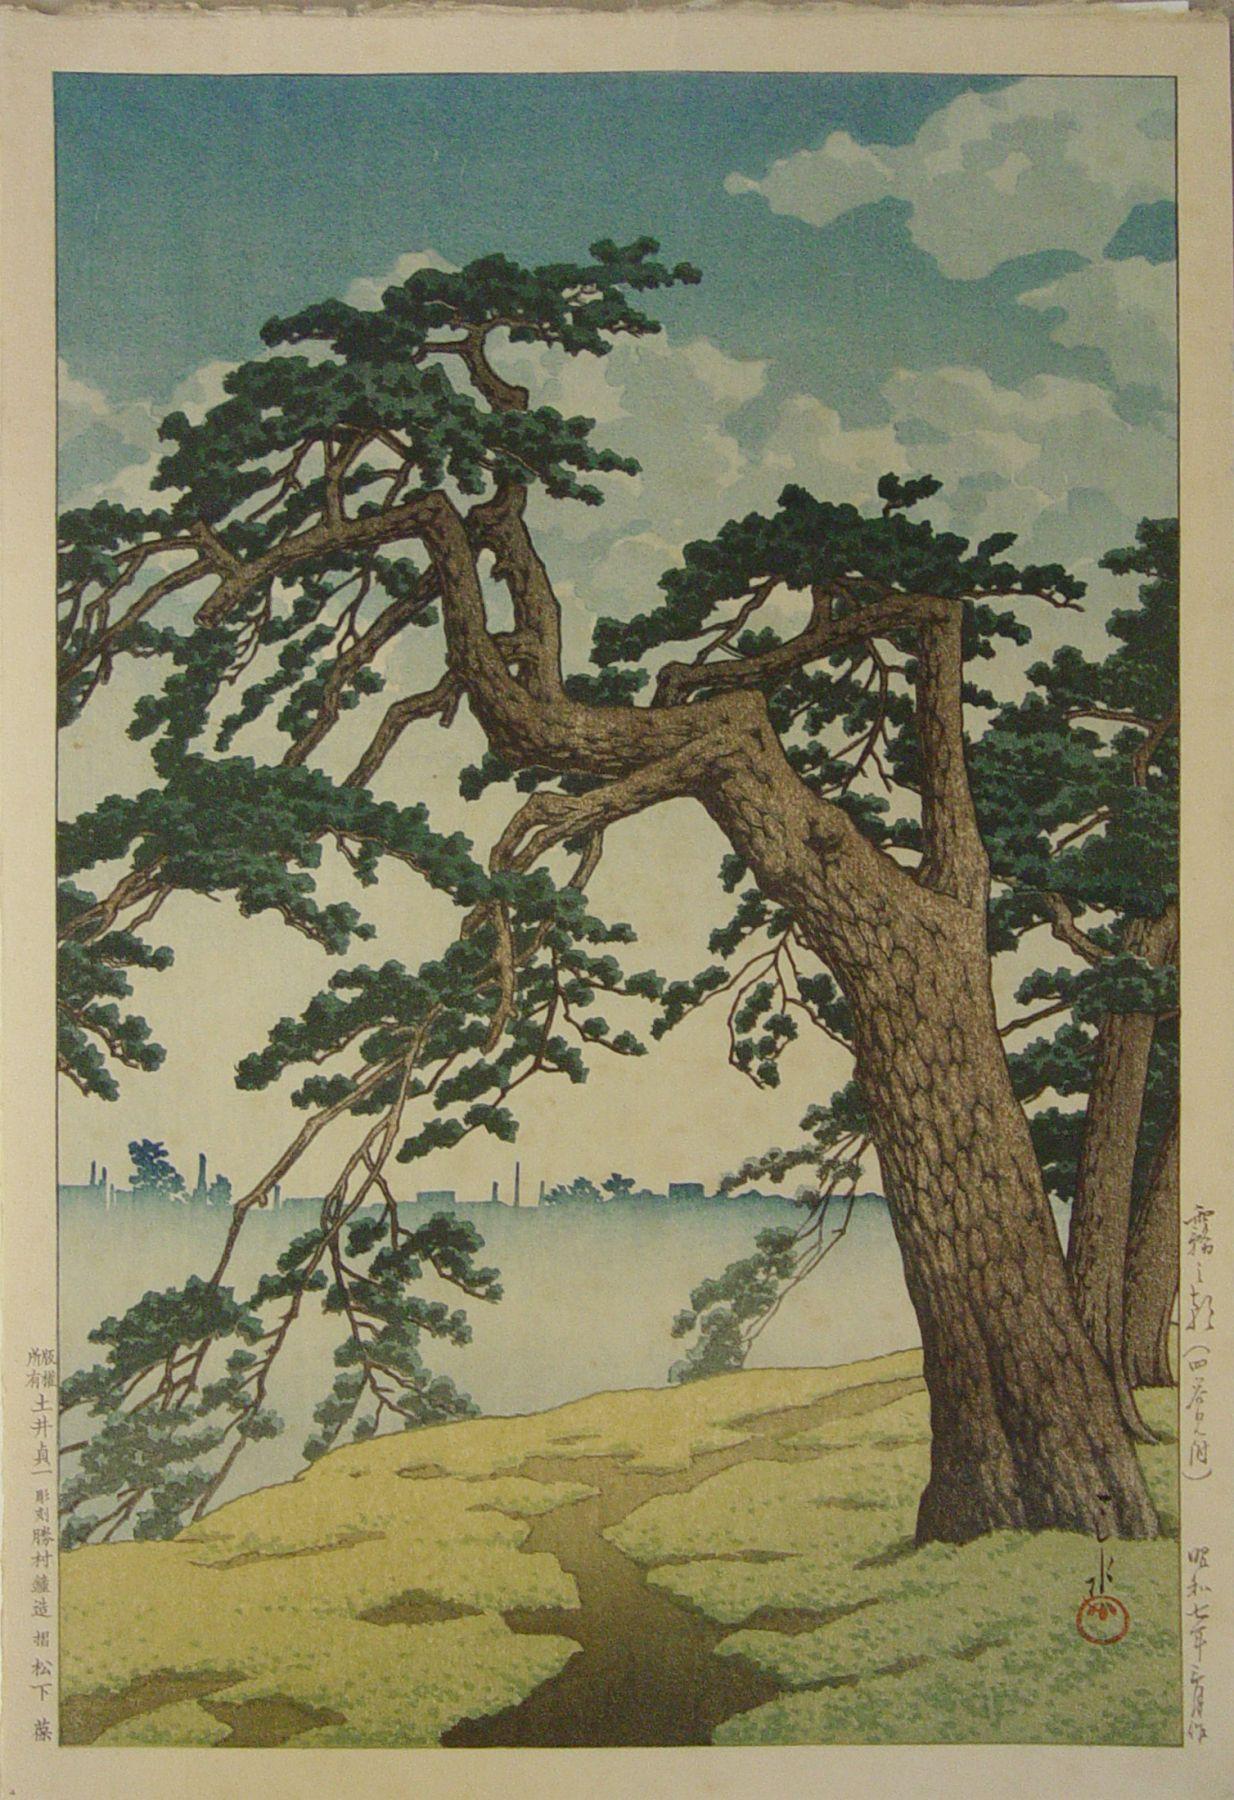 Kawase Hasui (1883-1957), Misty Morning at Yotsuya Approach